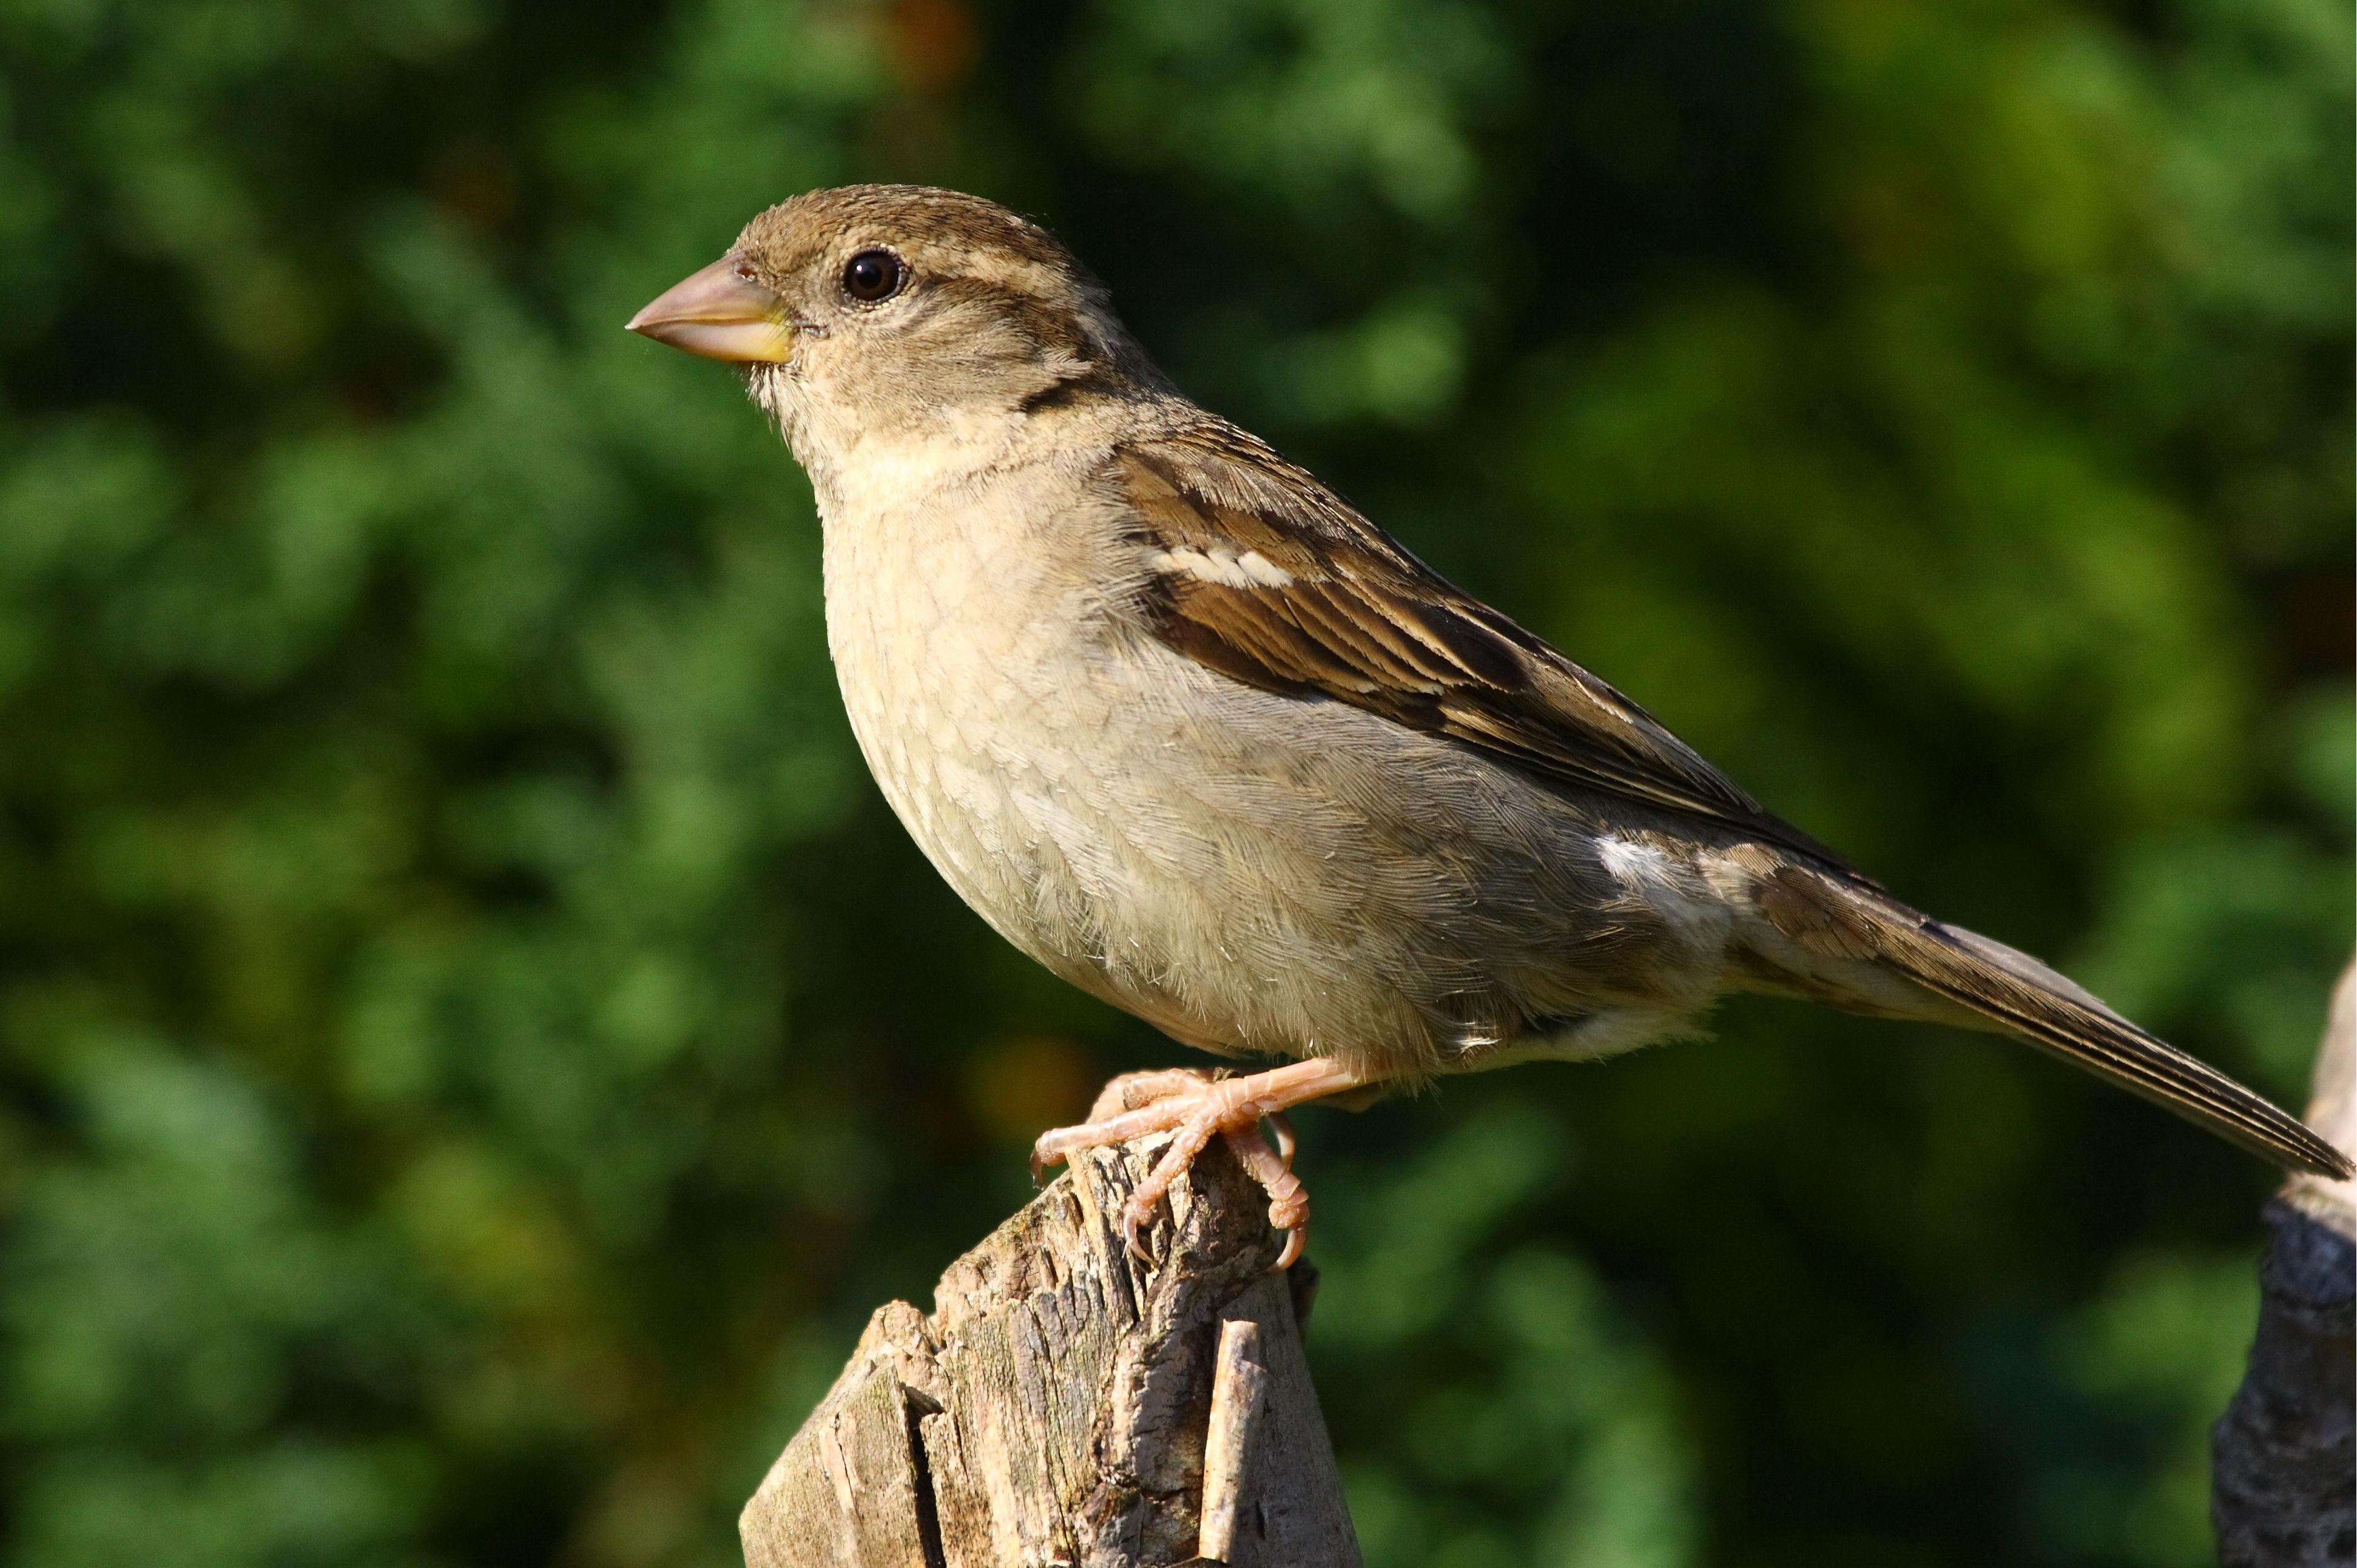 File:Female House Sparrow.jpg - Wikimedia Commons